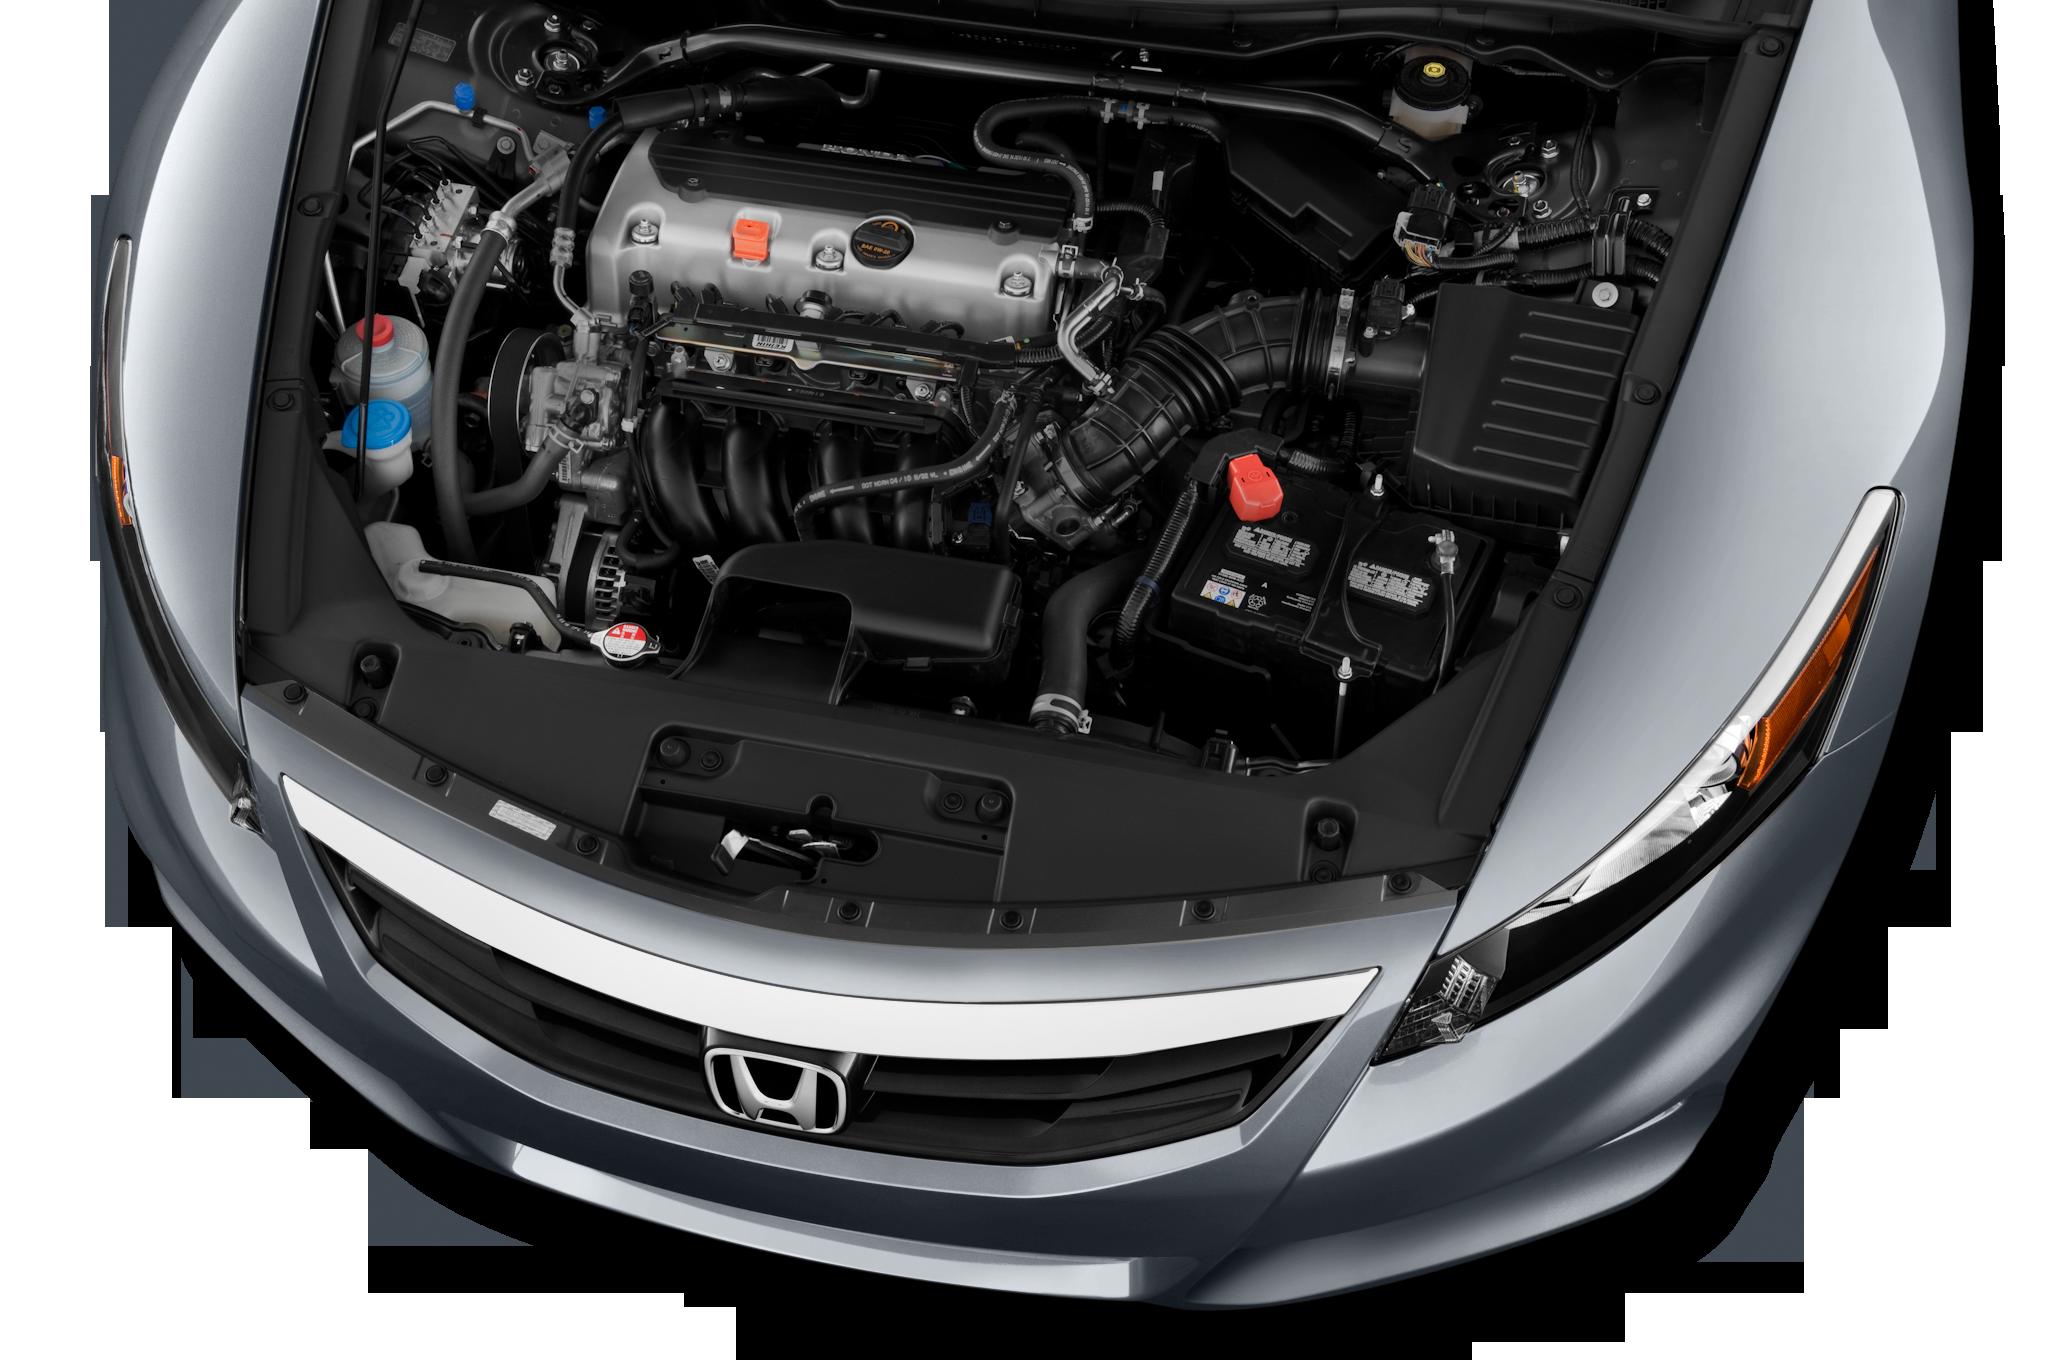 2011 Honda Accord Improves Fuel Economy Ratings Makes